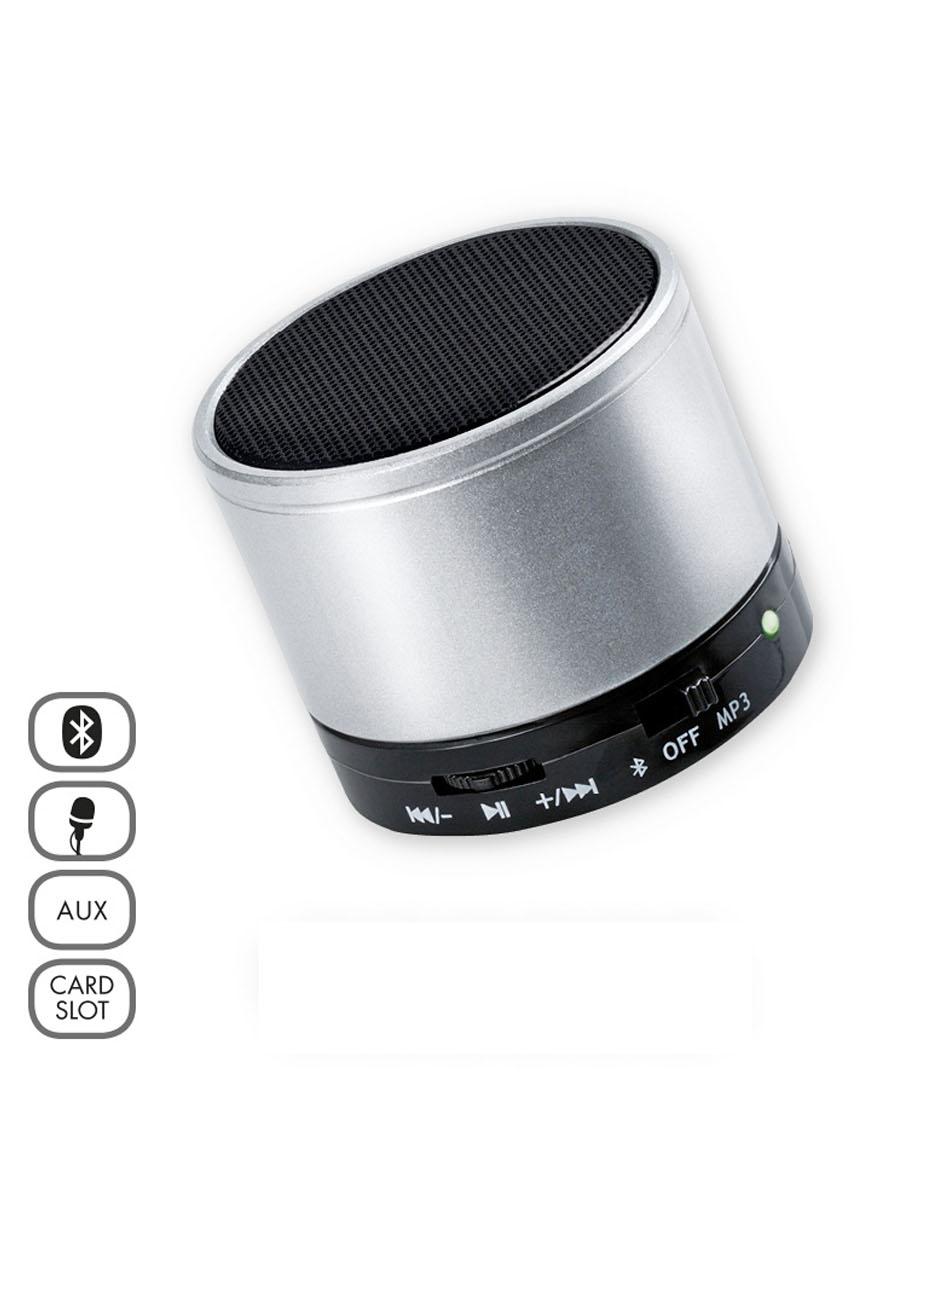 bluetooth speaker mit sd kartenslot und mikrofon merkur. Black Bedroom Furniture Sets. Home Design Ideas